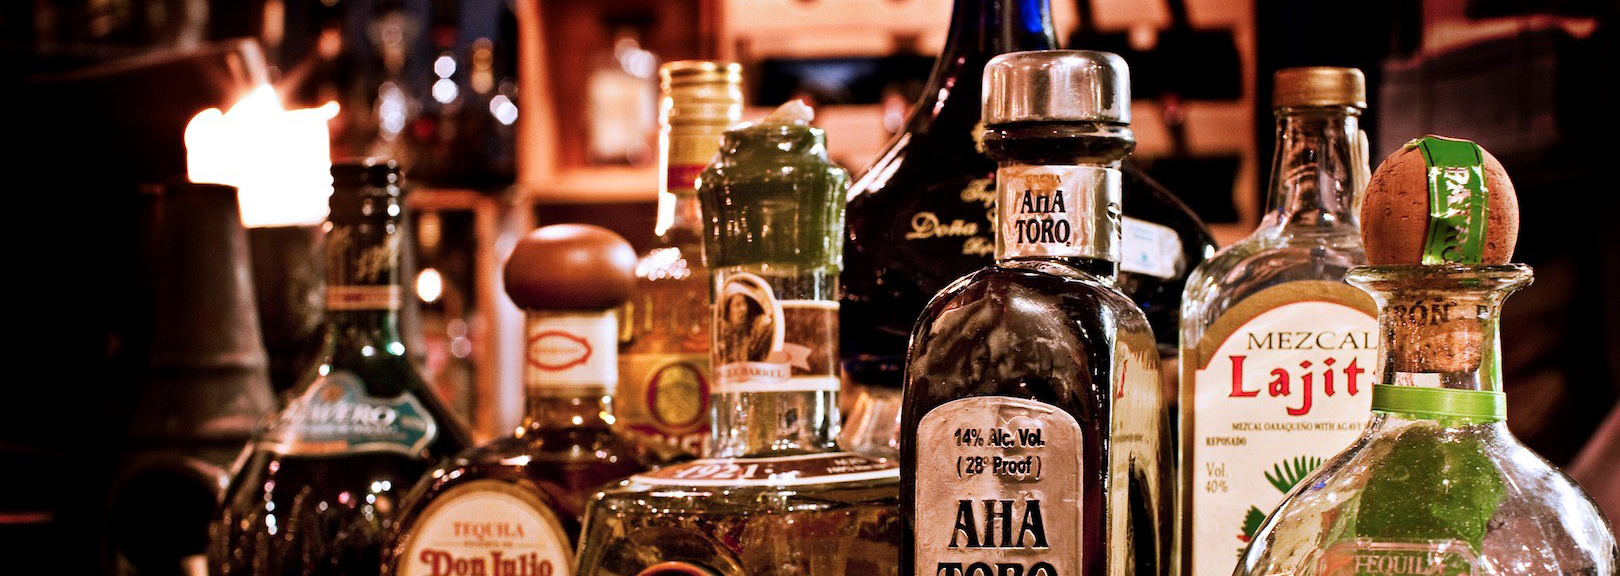 El Viejo - drikkekort